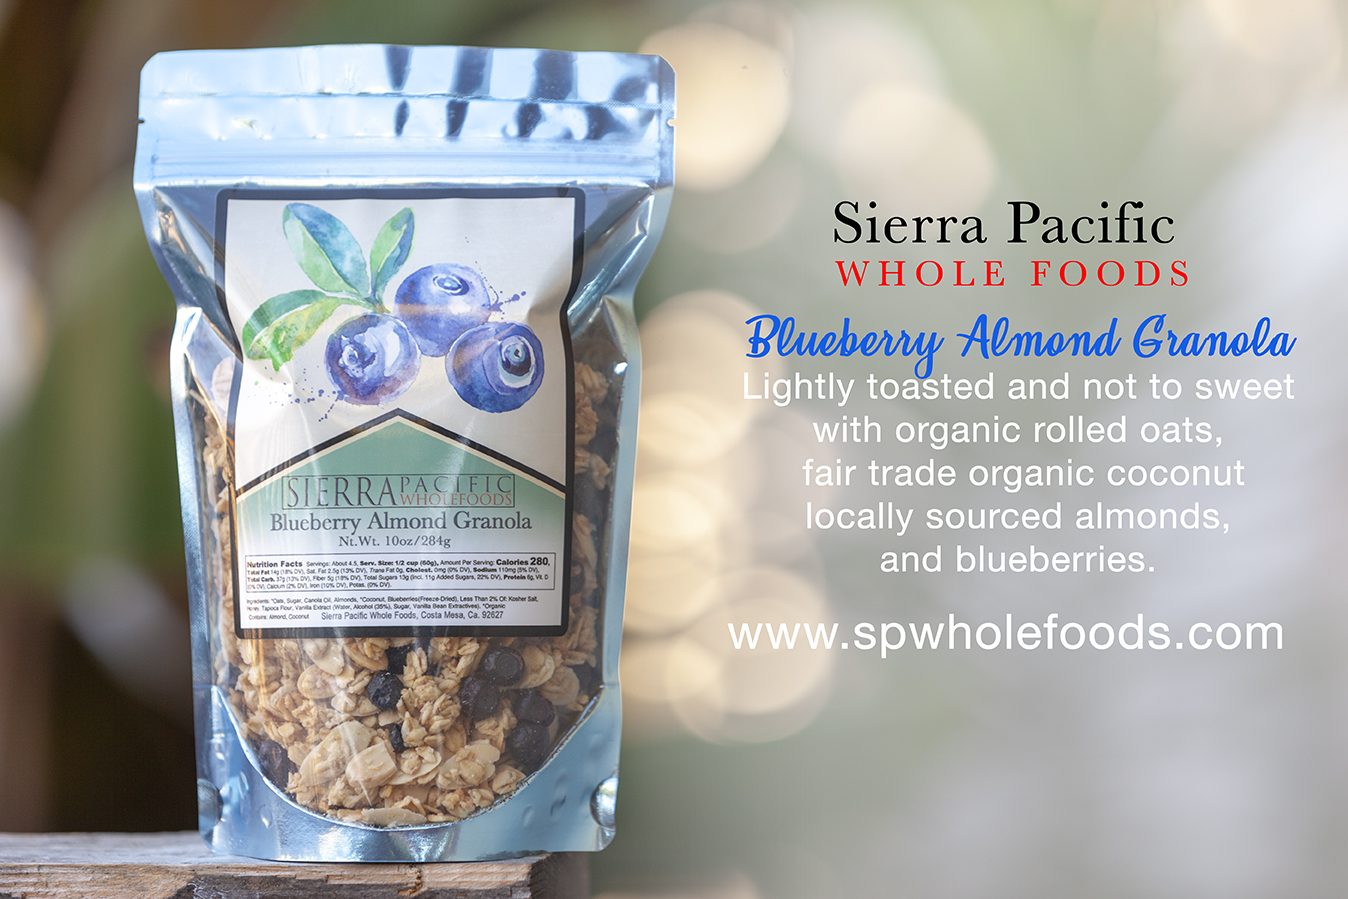 blueberryalmondgranola.jpg